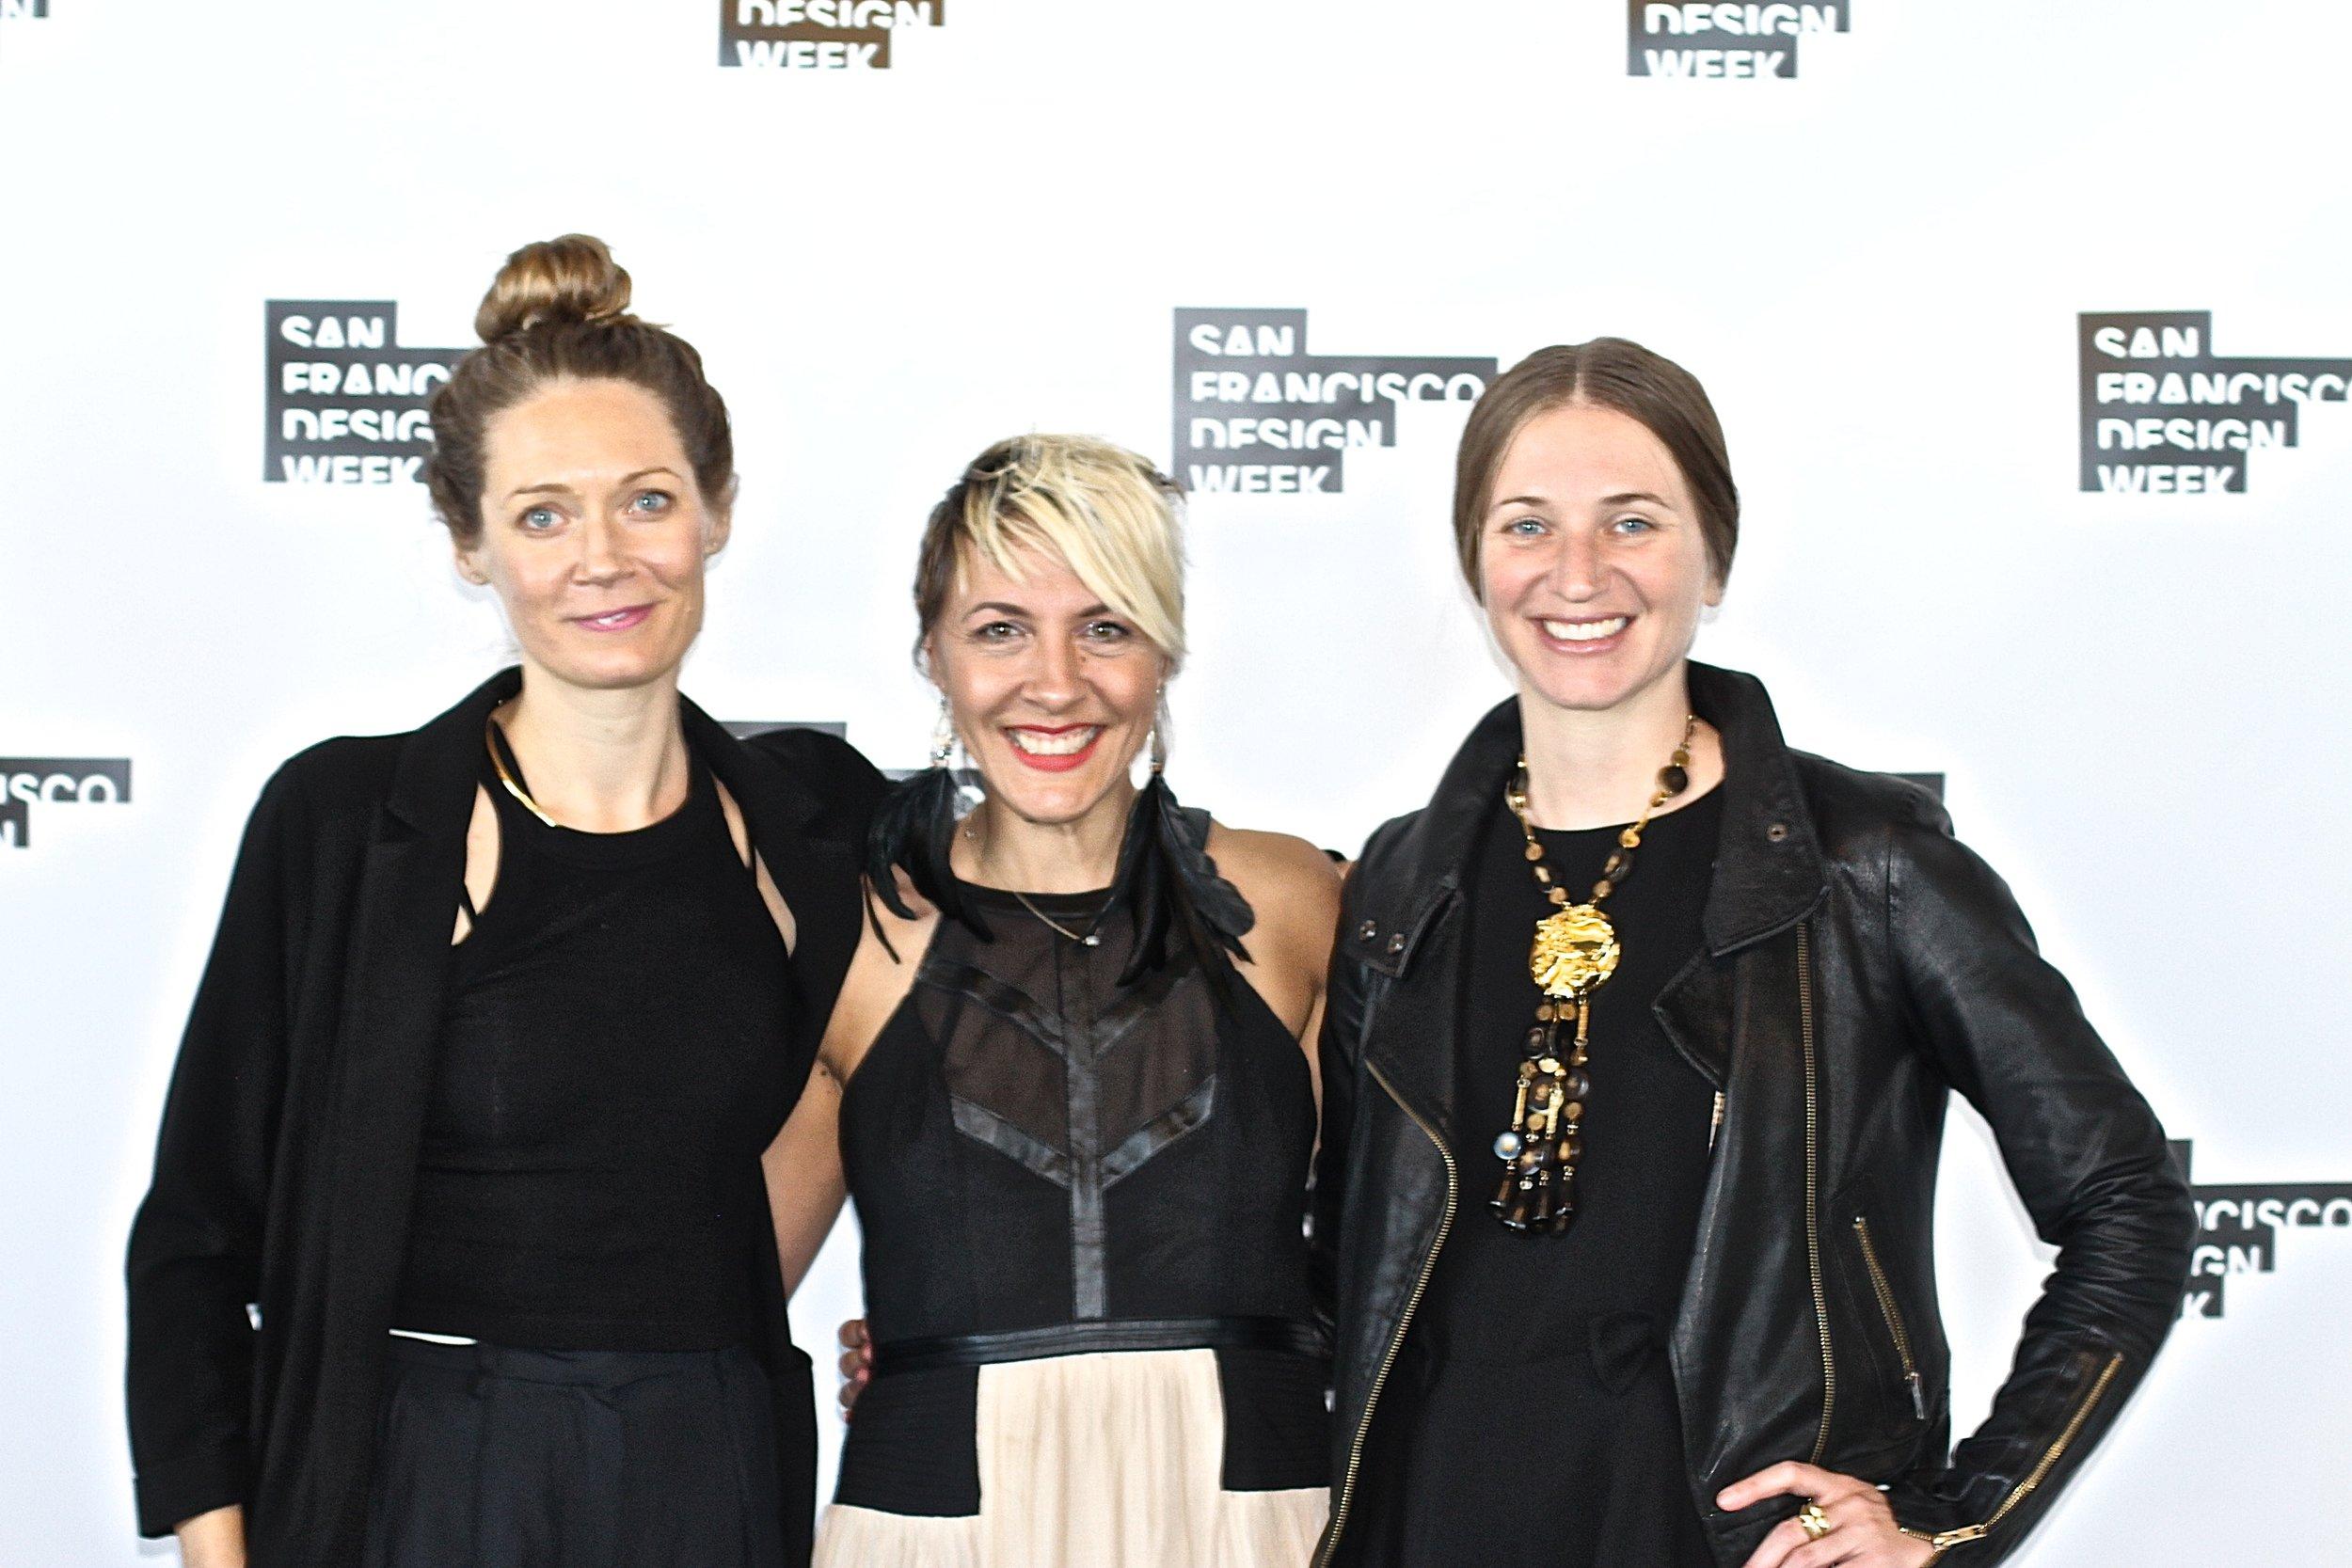 Artist Rhonda Holberton, Paige Loczi of LOCZIdesign and Aimee Friberg of CULT Exhibitions